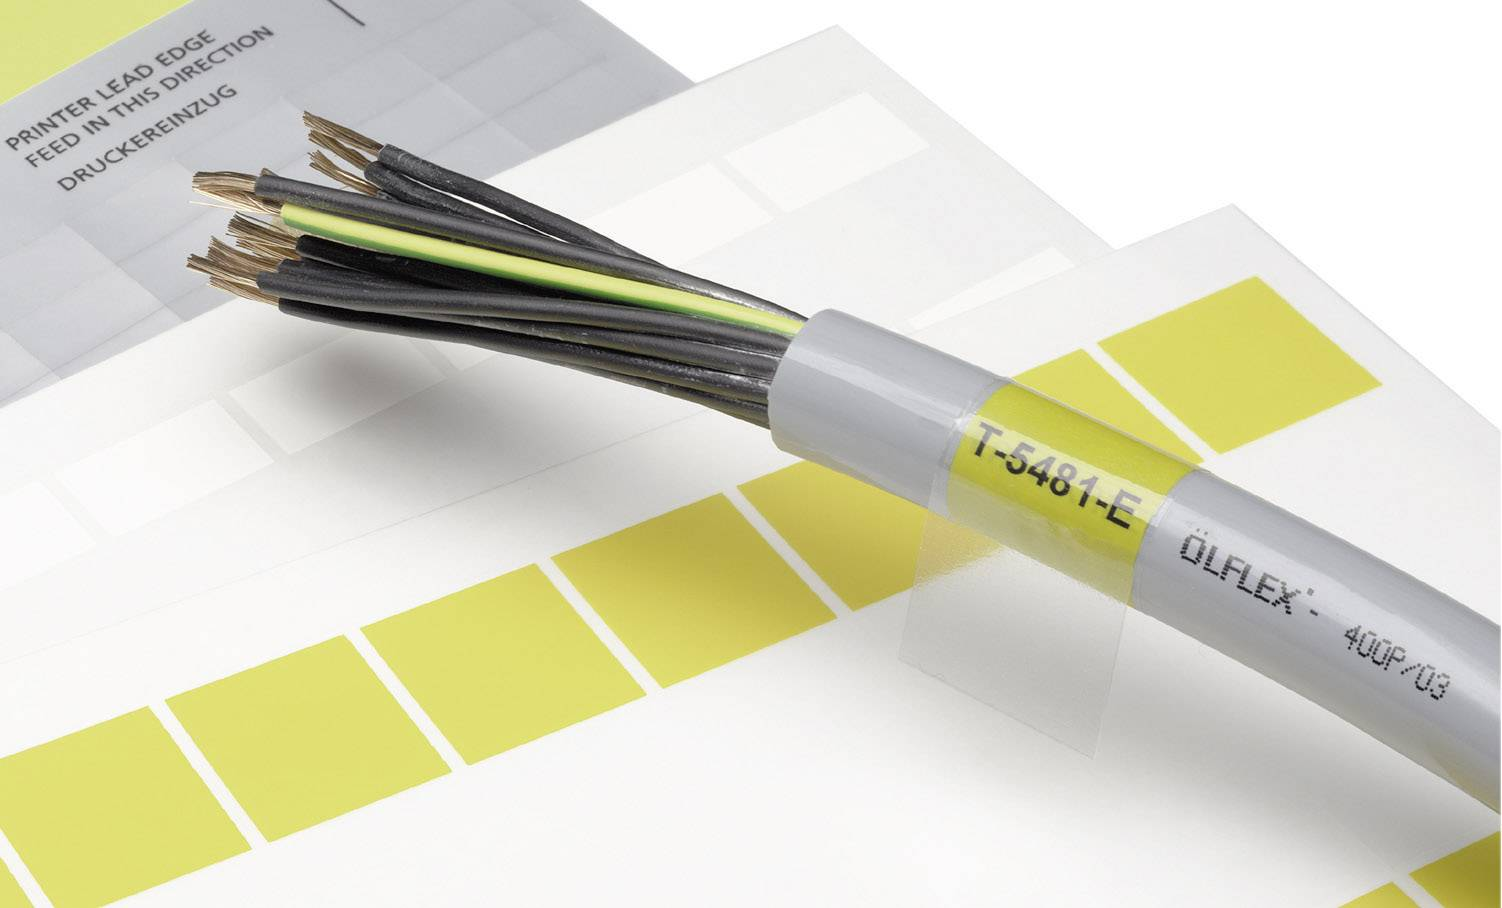 Etikety LappKabel LCK-45 WH (83256149), bílá